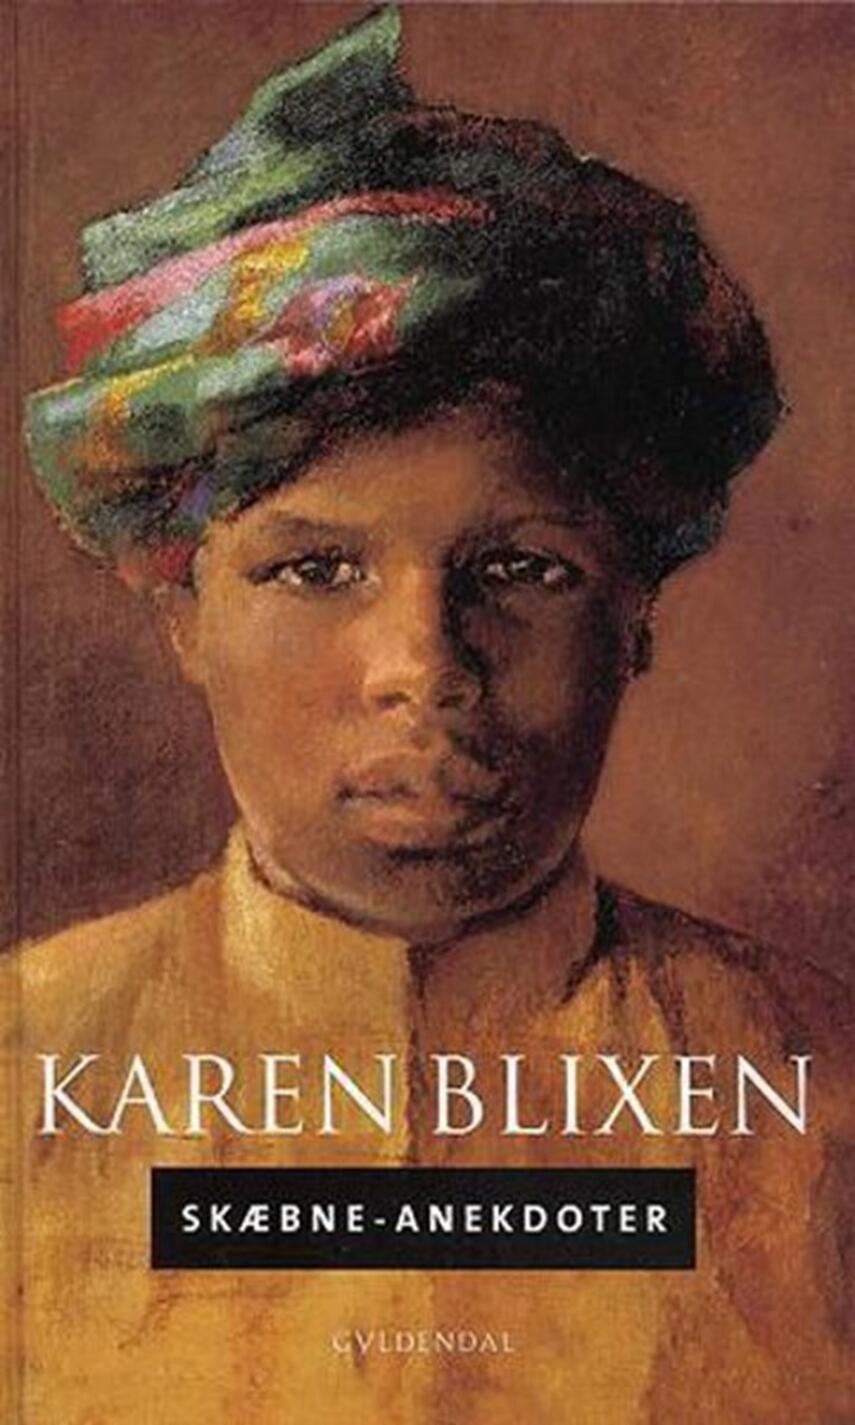 Karen Blixen: Skæbne-anekdoter